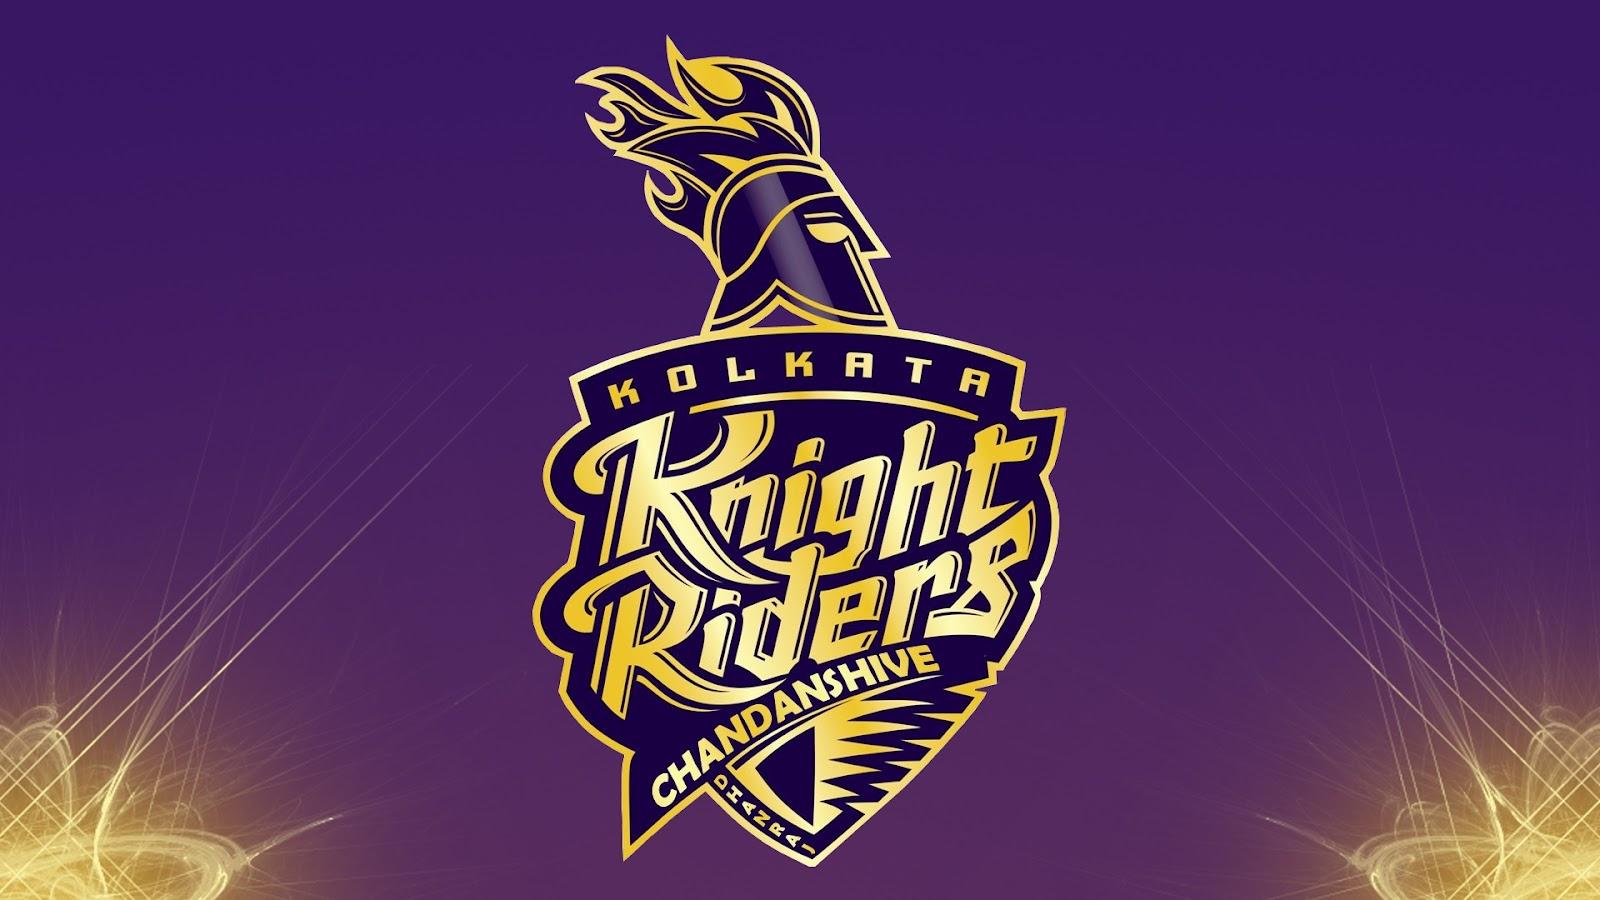 KKR KOLKATA KNIGHT RIDERS NEW LOGO kkr kolkata knight riders new logo 1600x900